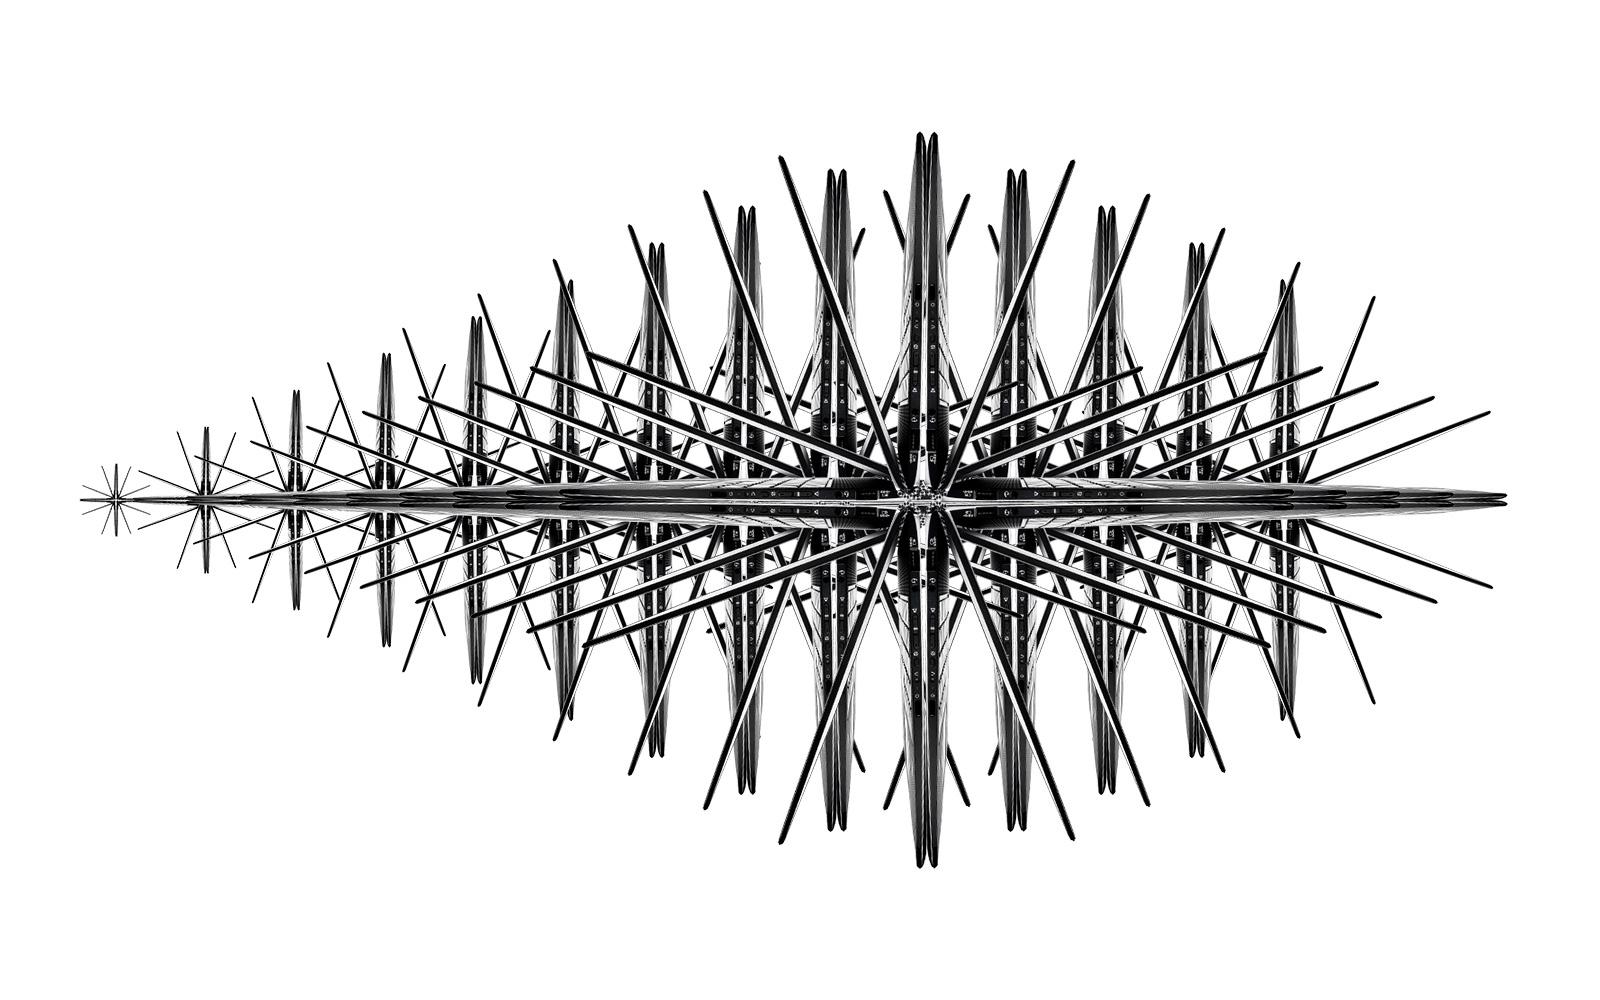 MW-array-2-LY02243.jpg